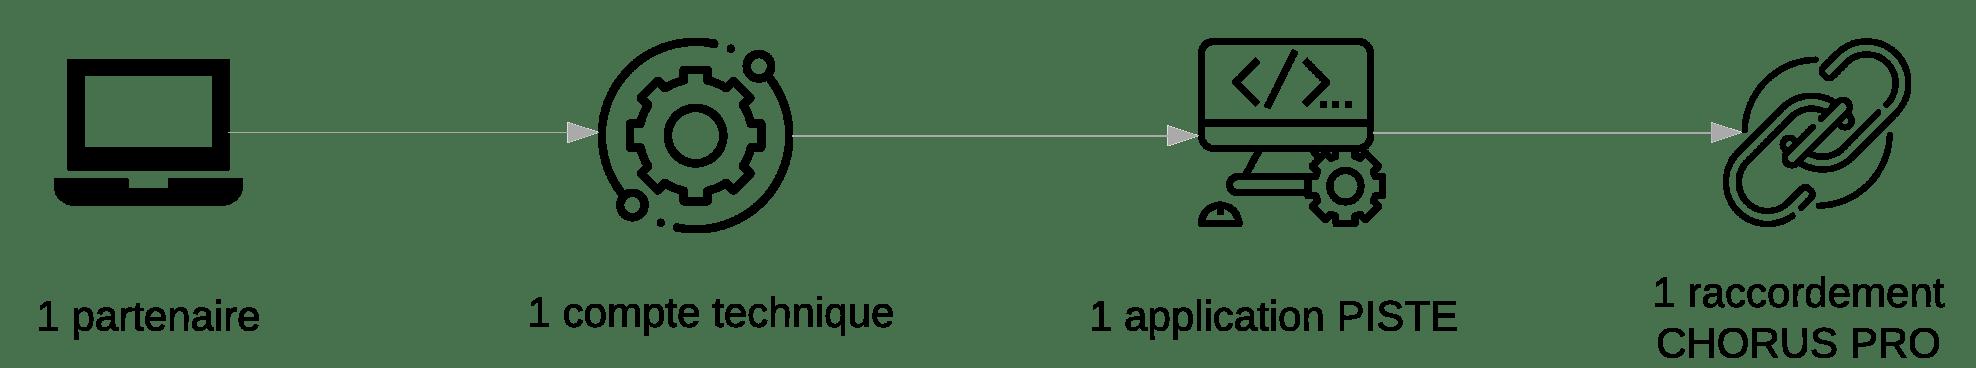 Schéma raccordement API en direct